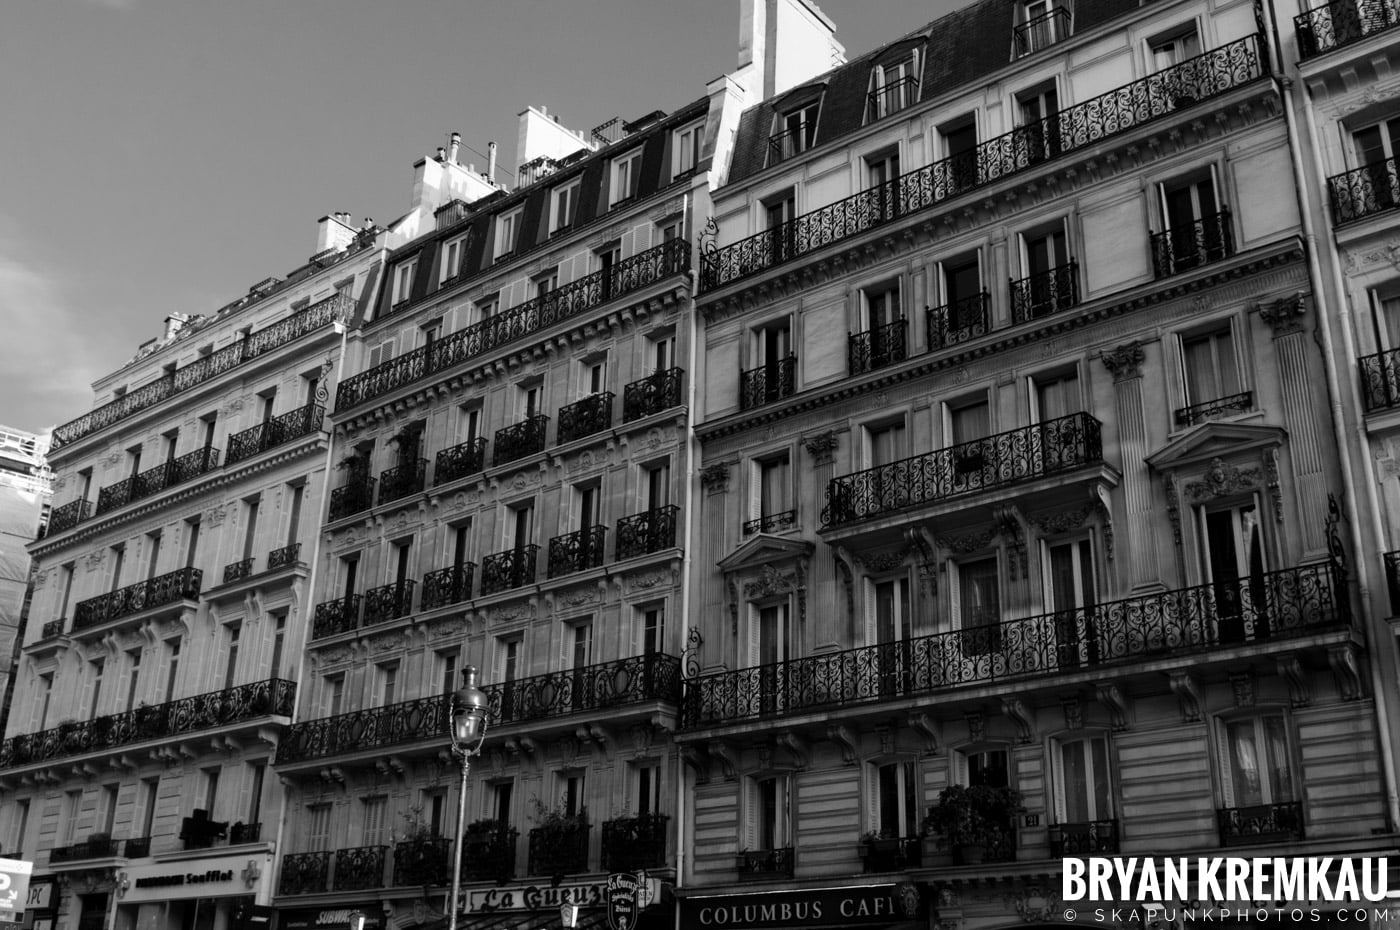 Paris, France Honeymoon - Day 8 - 7.25.11 (4)